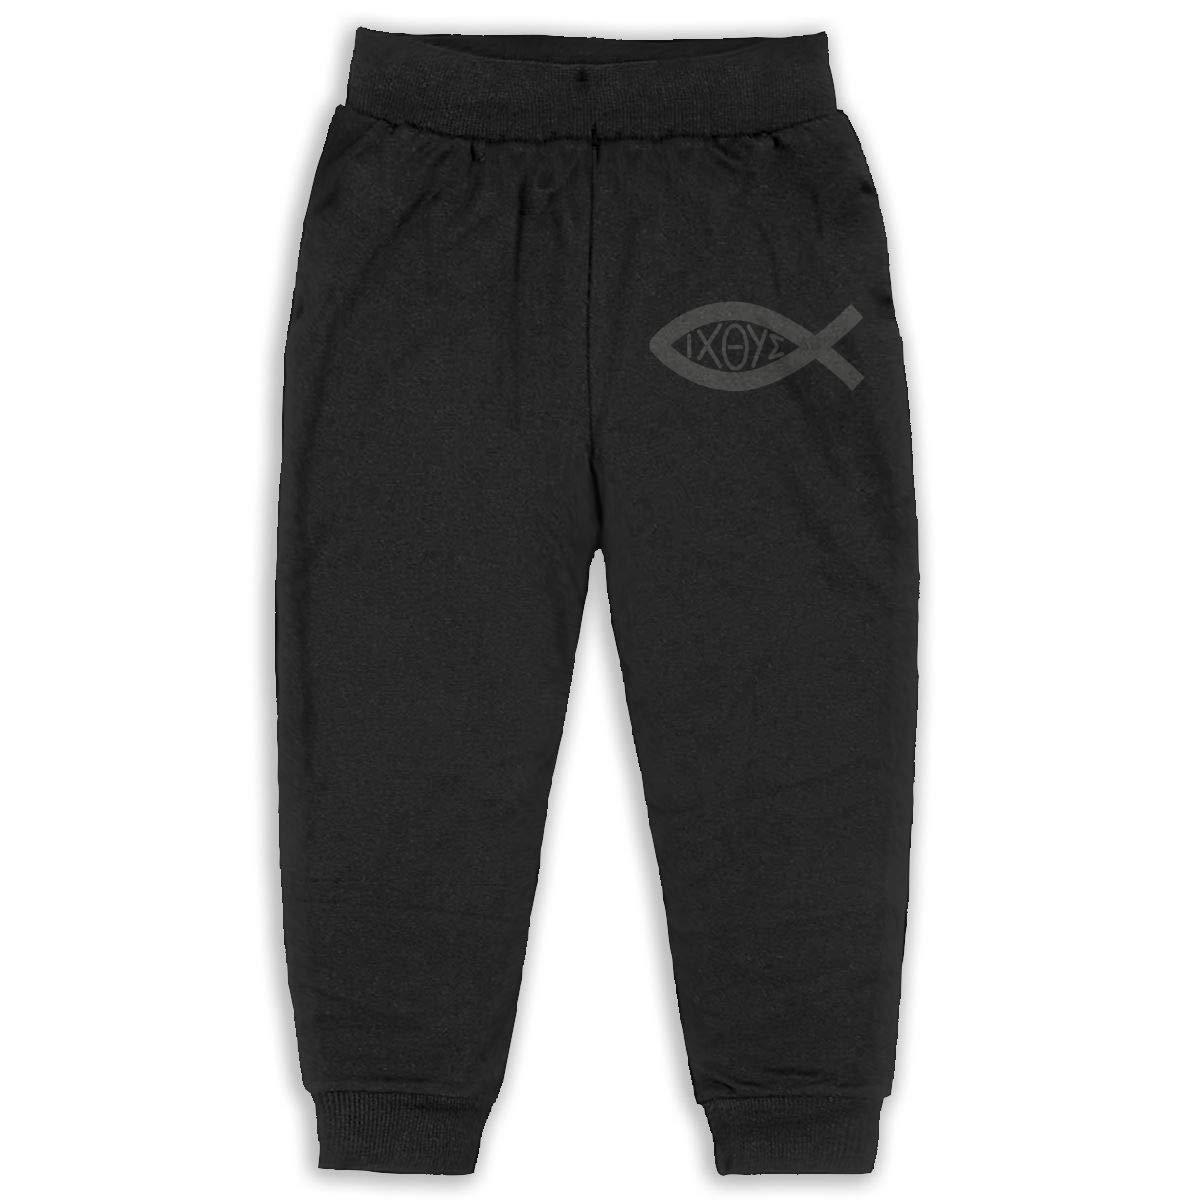 Fleece Active Joggers Elastic Pants DaXi1 Ichthys Sweatpants for Boys /& Girls